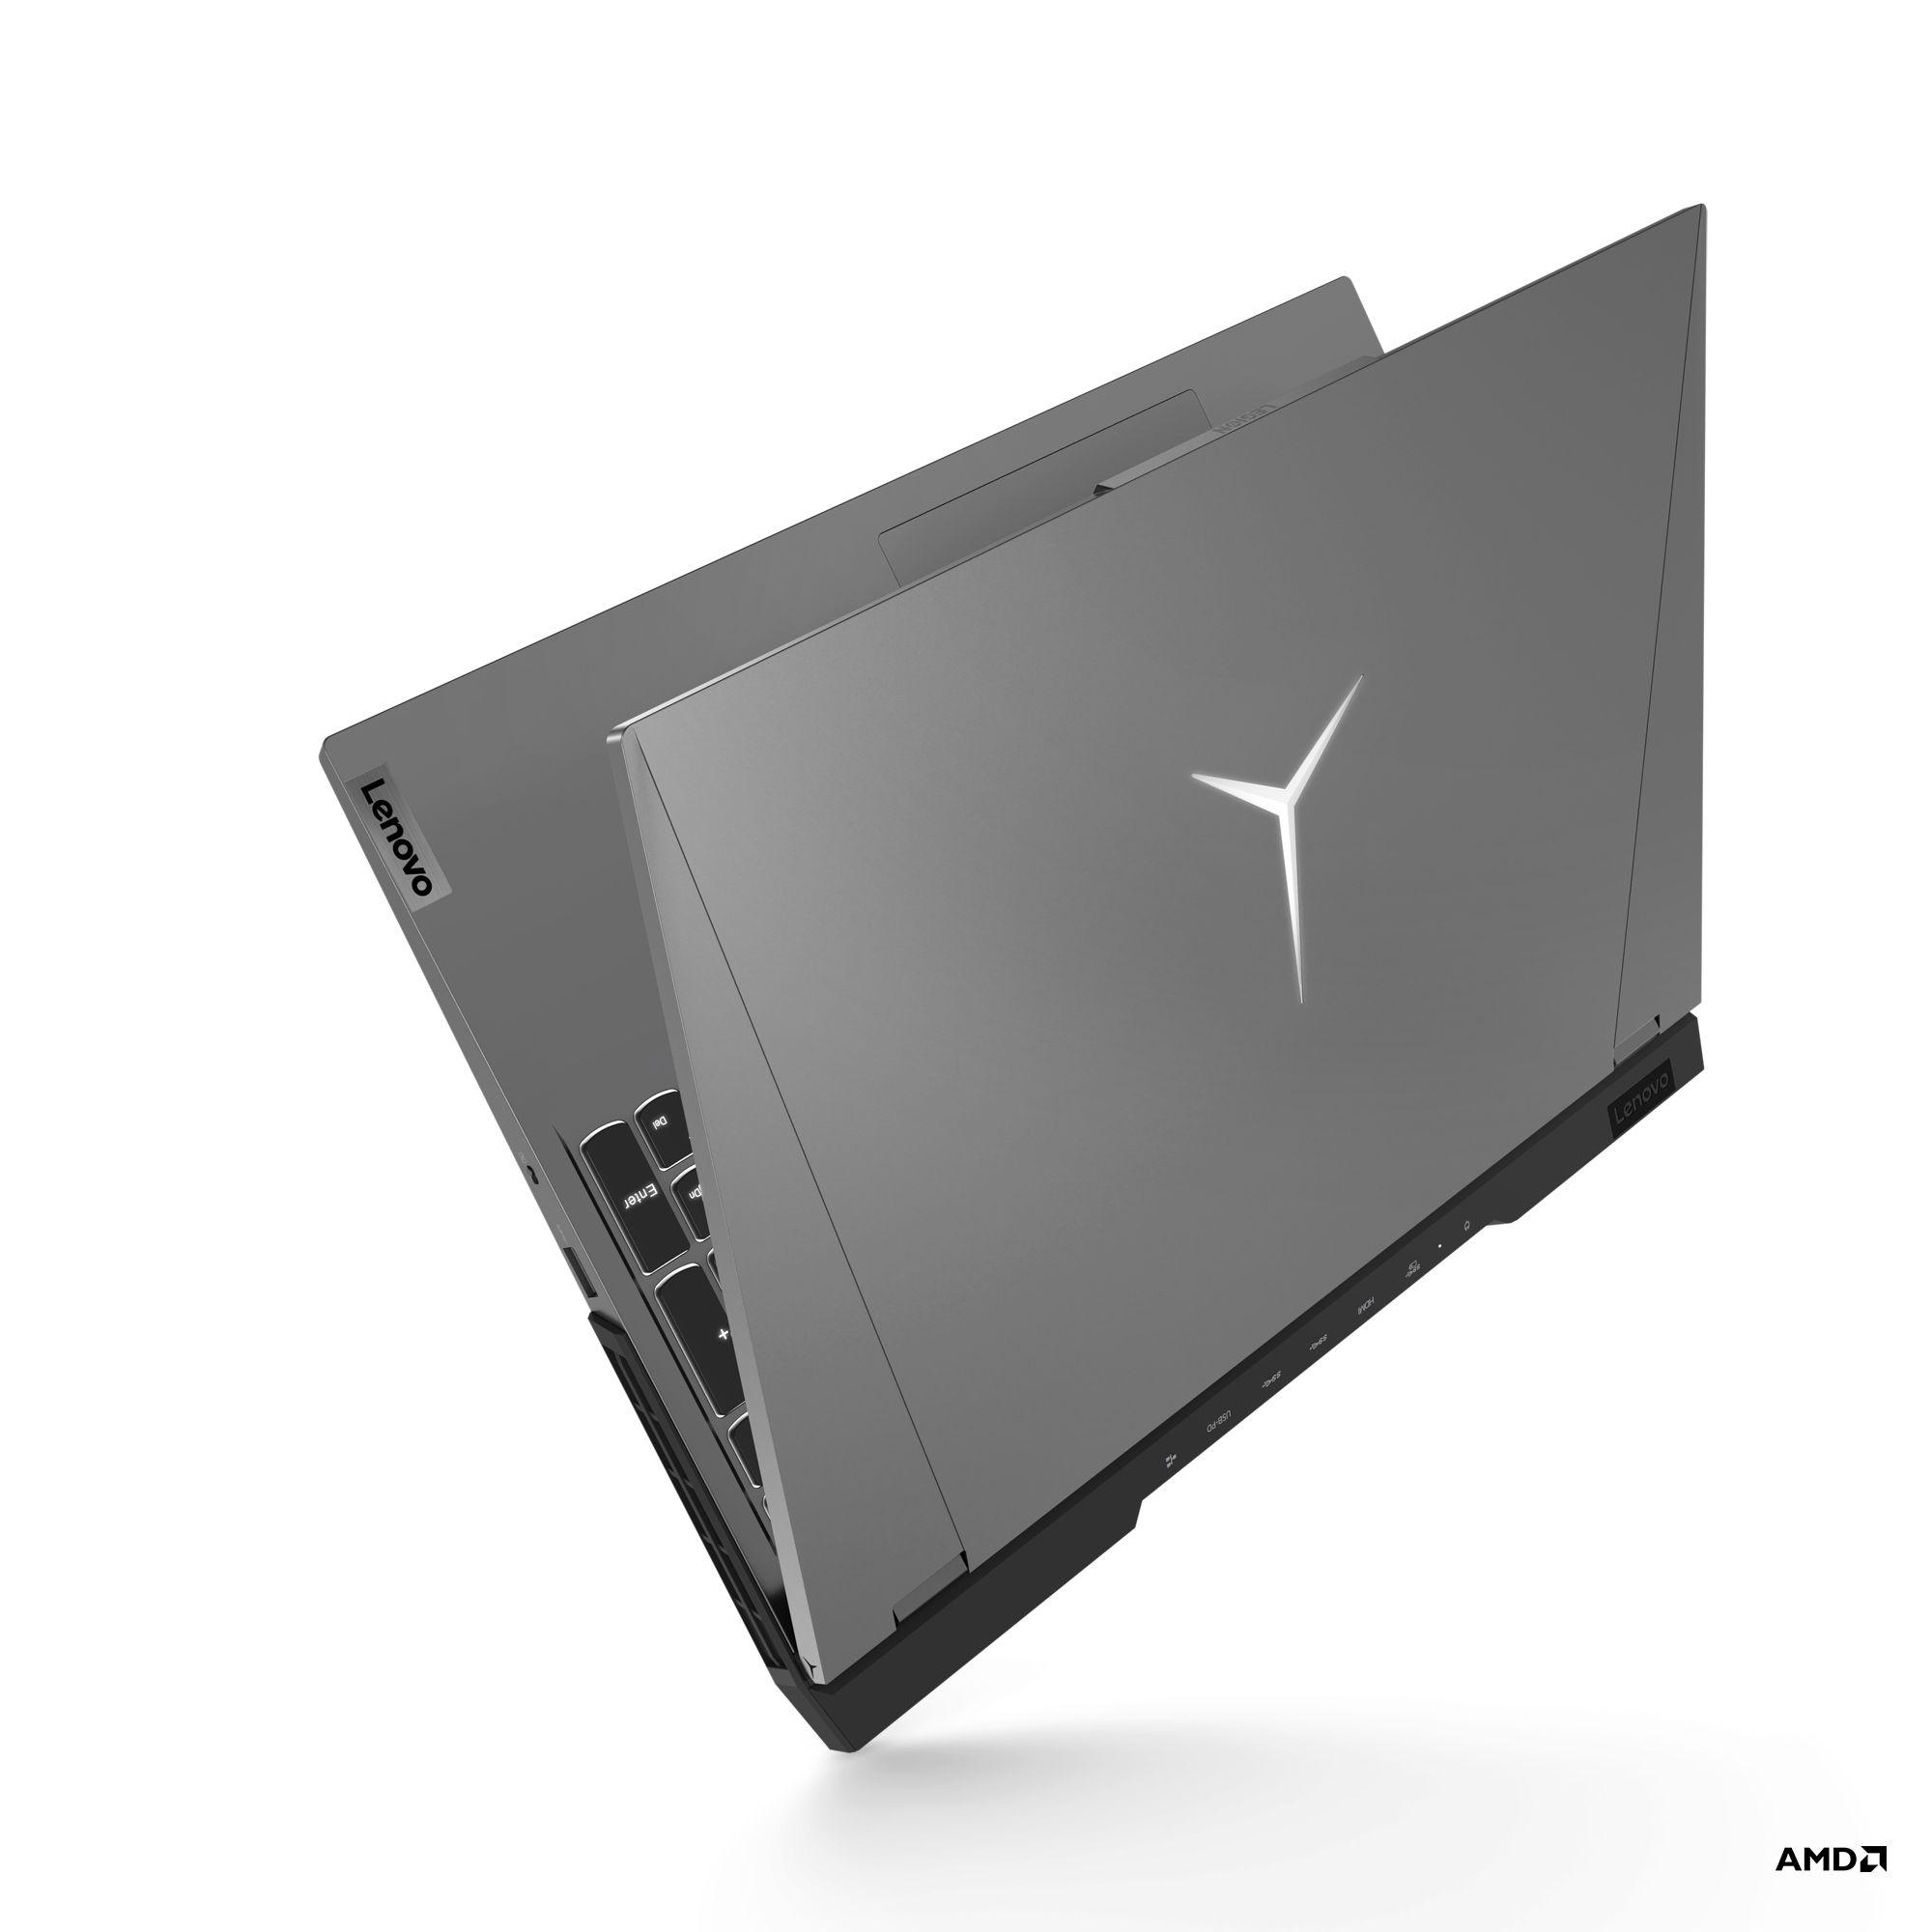 Lenovo_Legion_5_Pro_Cover_Storm_Grey_P